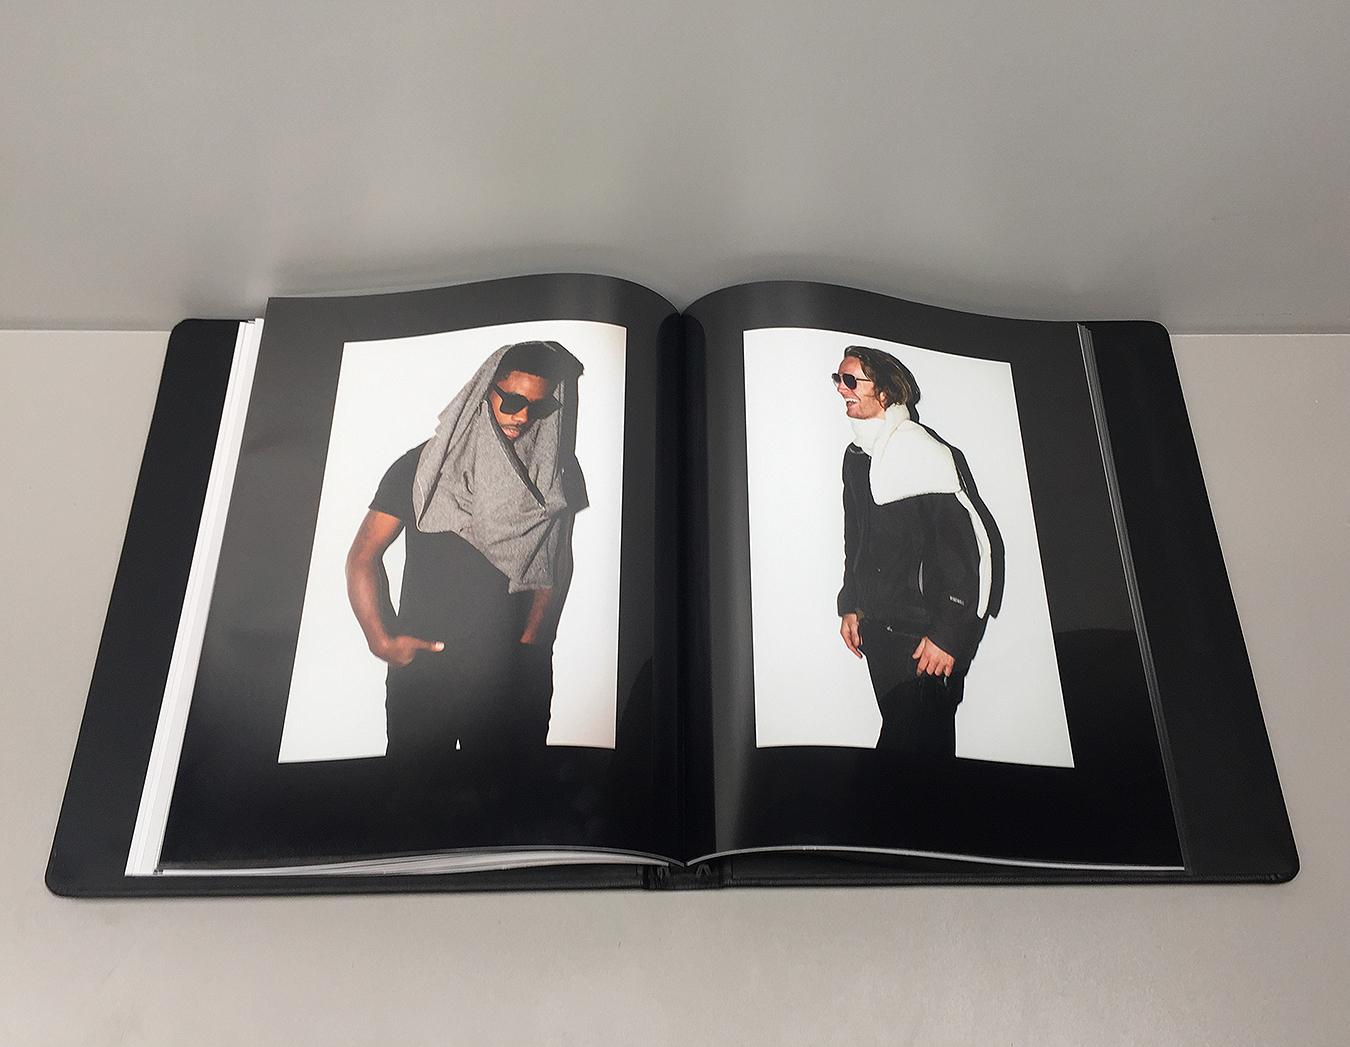 Tony_Ward_Studio_portfolio_presentations_fashion_class_student_Ruoyang_Ni_Nudes_lesbian_love_asian_women_erotica_Upenn_branding_male_models